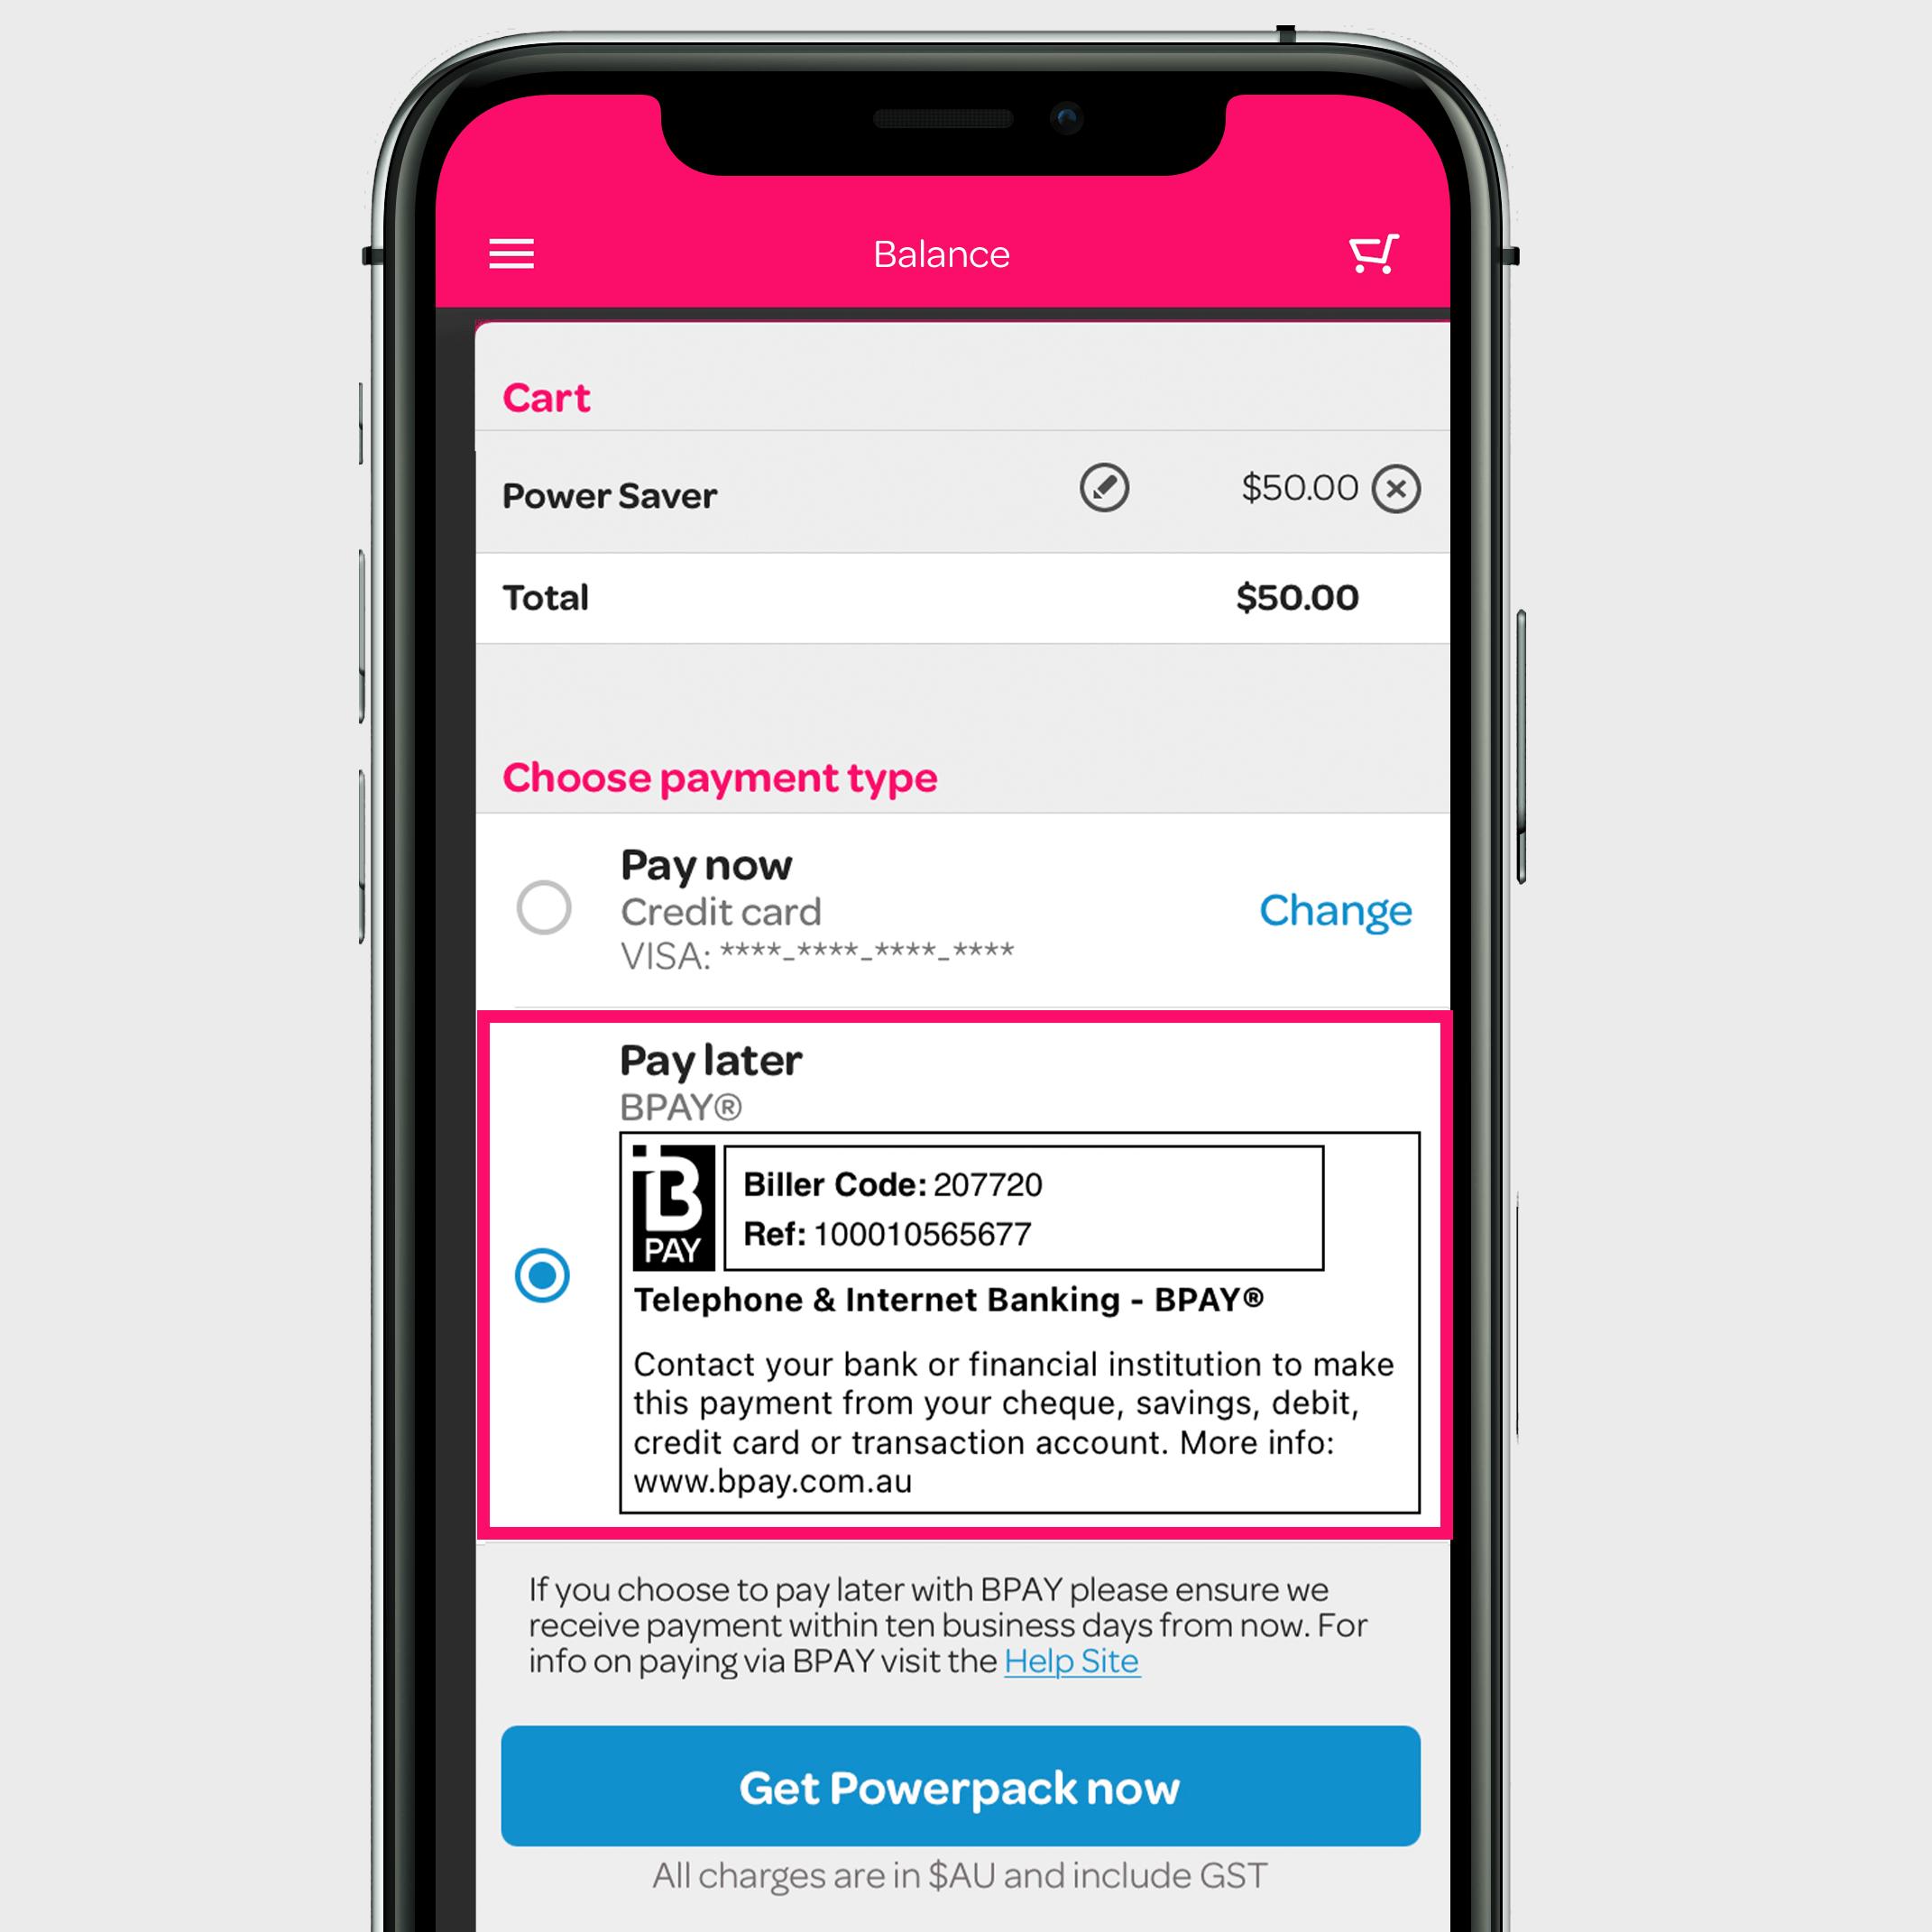 image of the Powershop app BPAY option